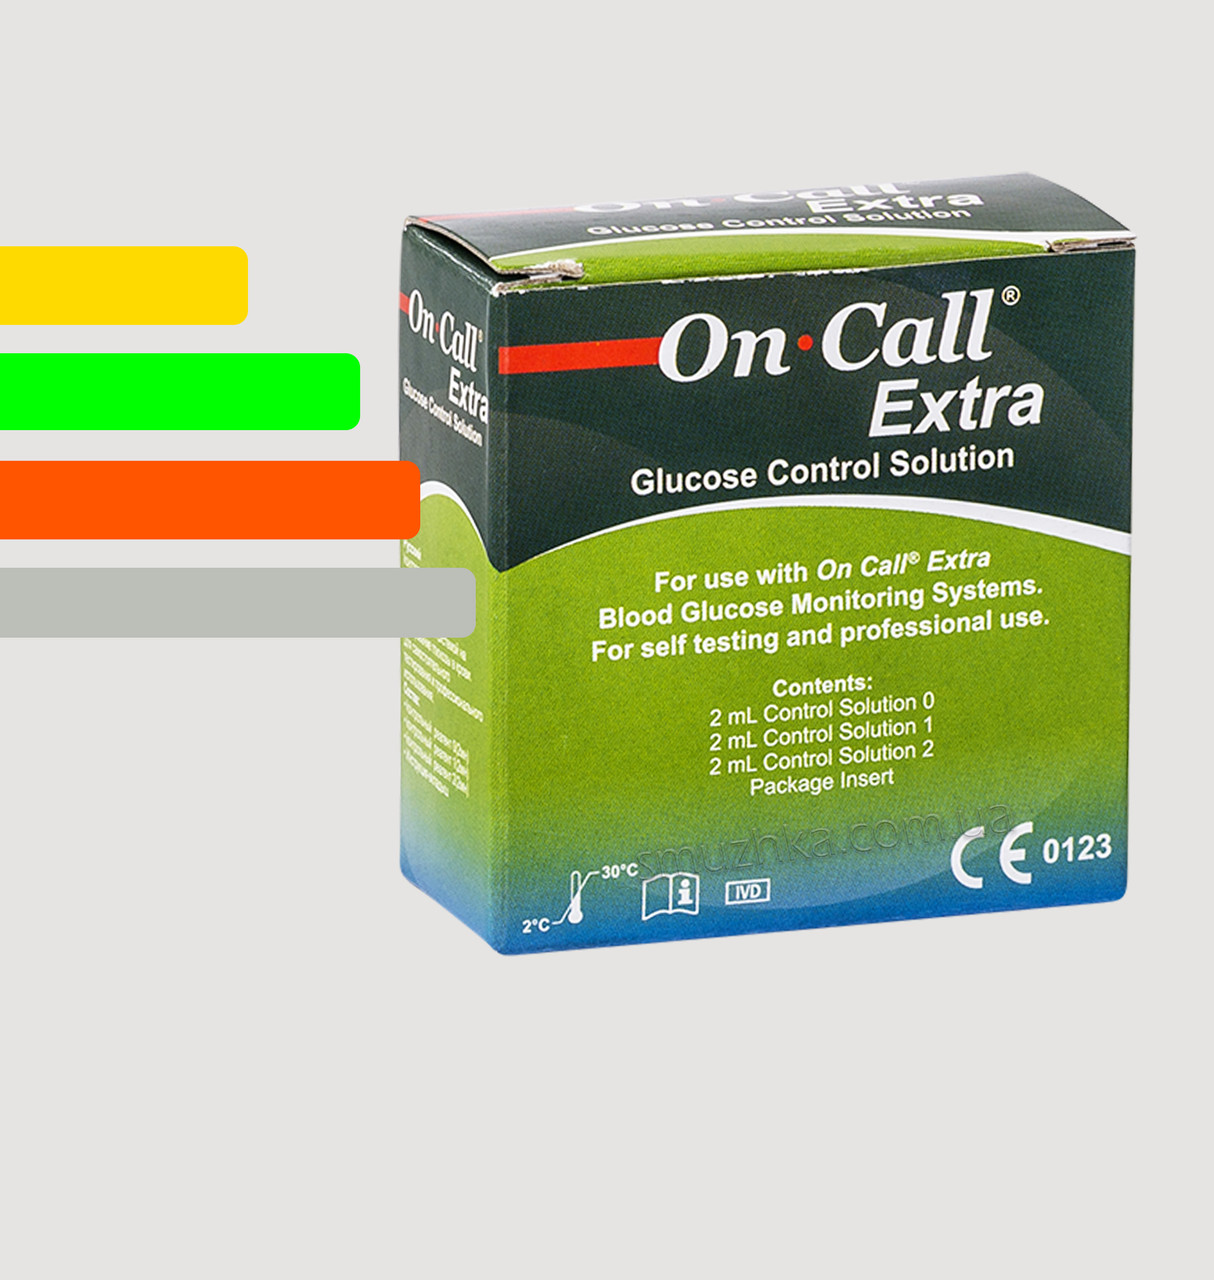 Тест полоски для глюкометра On Call Extra #50 - Онкол Экстра 50шт.